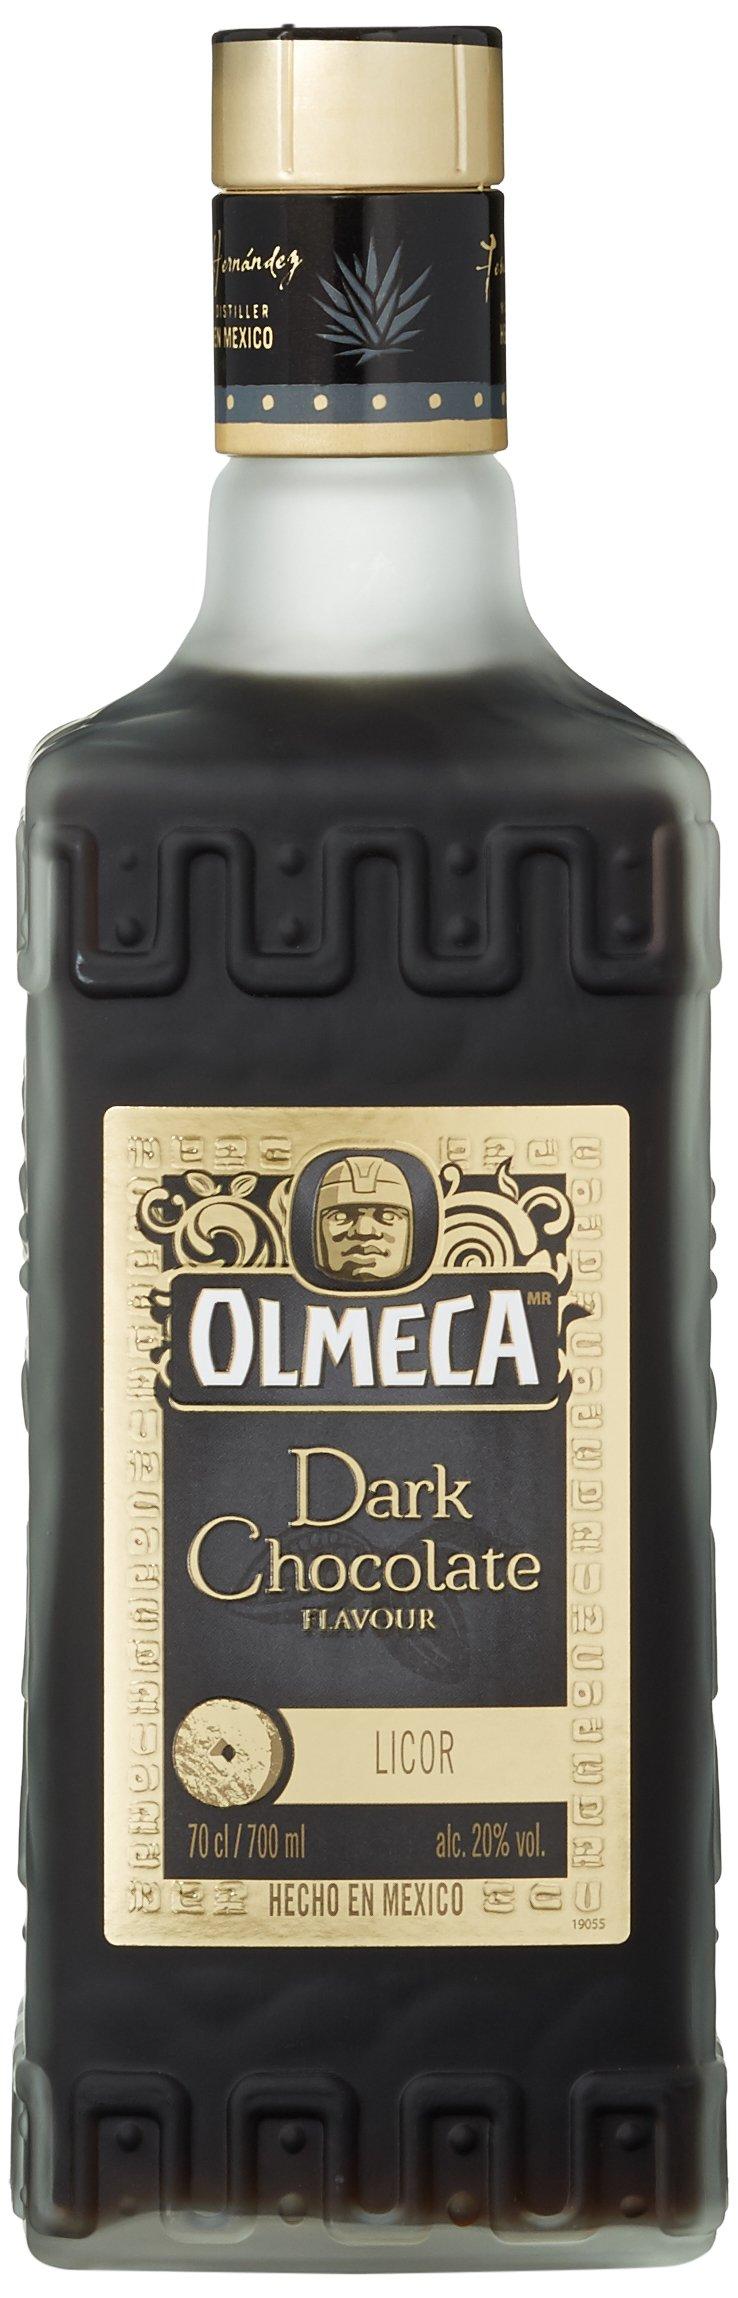 Olmeca-Fusin-Dark-Chocolate-Flavour-1-x-07-l